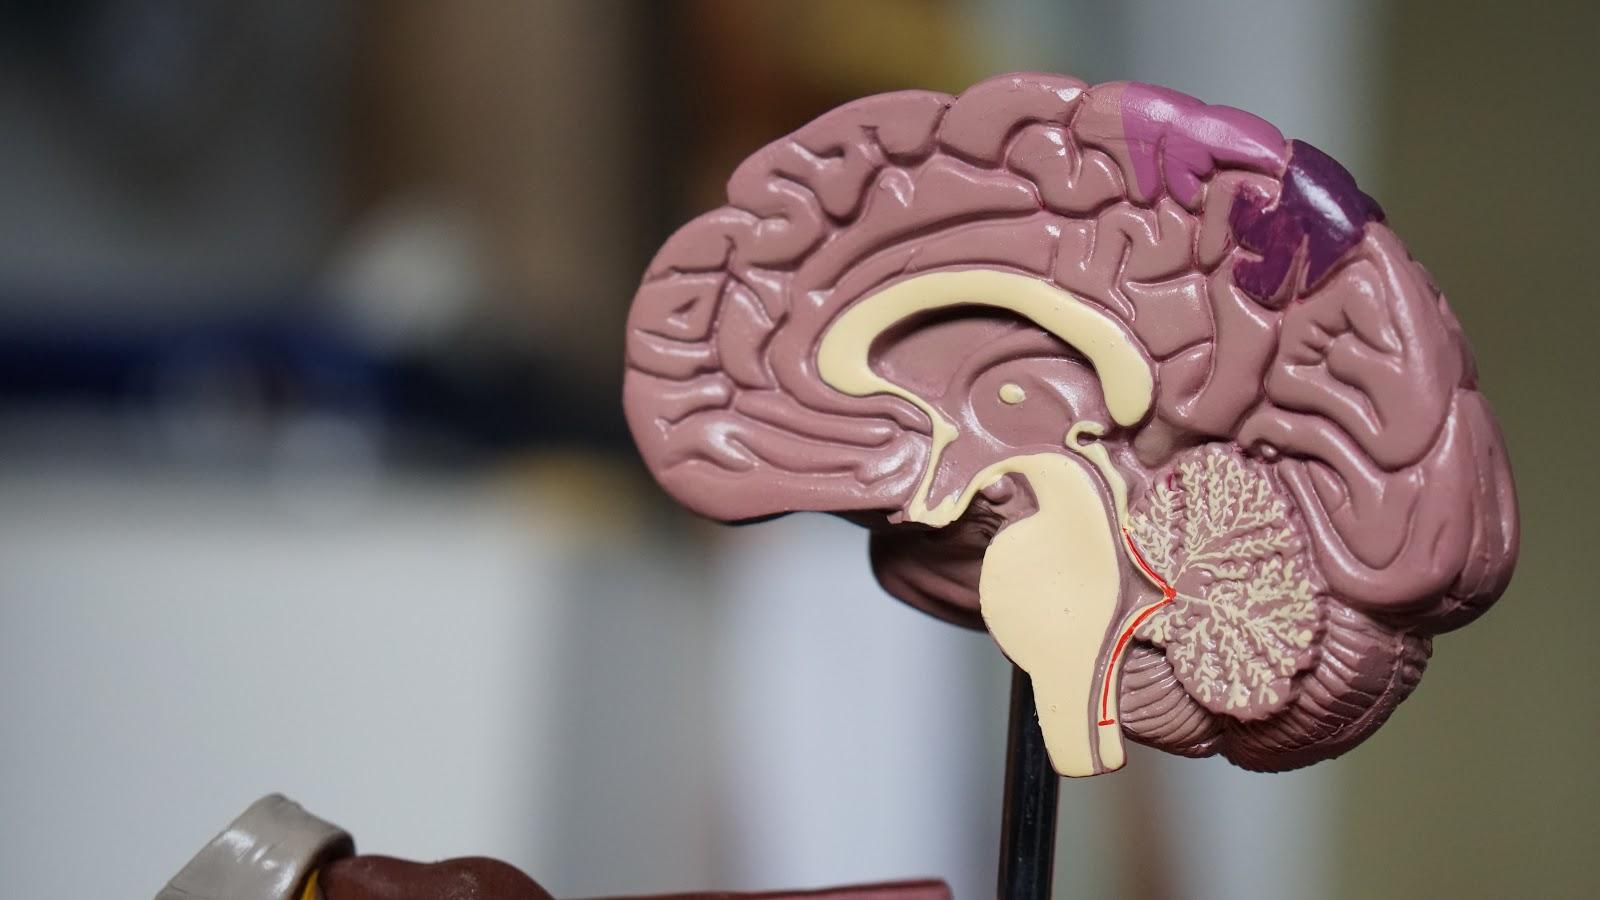 vagus nerve stimulation with xen by neuvana